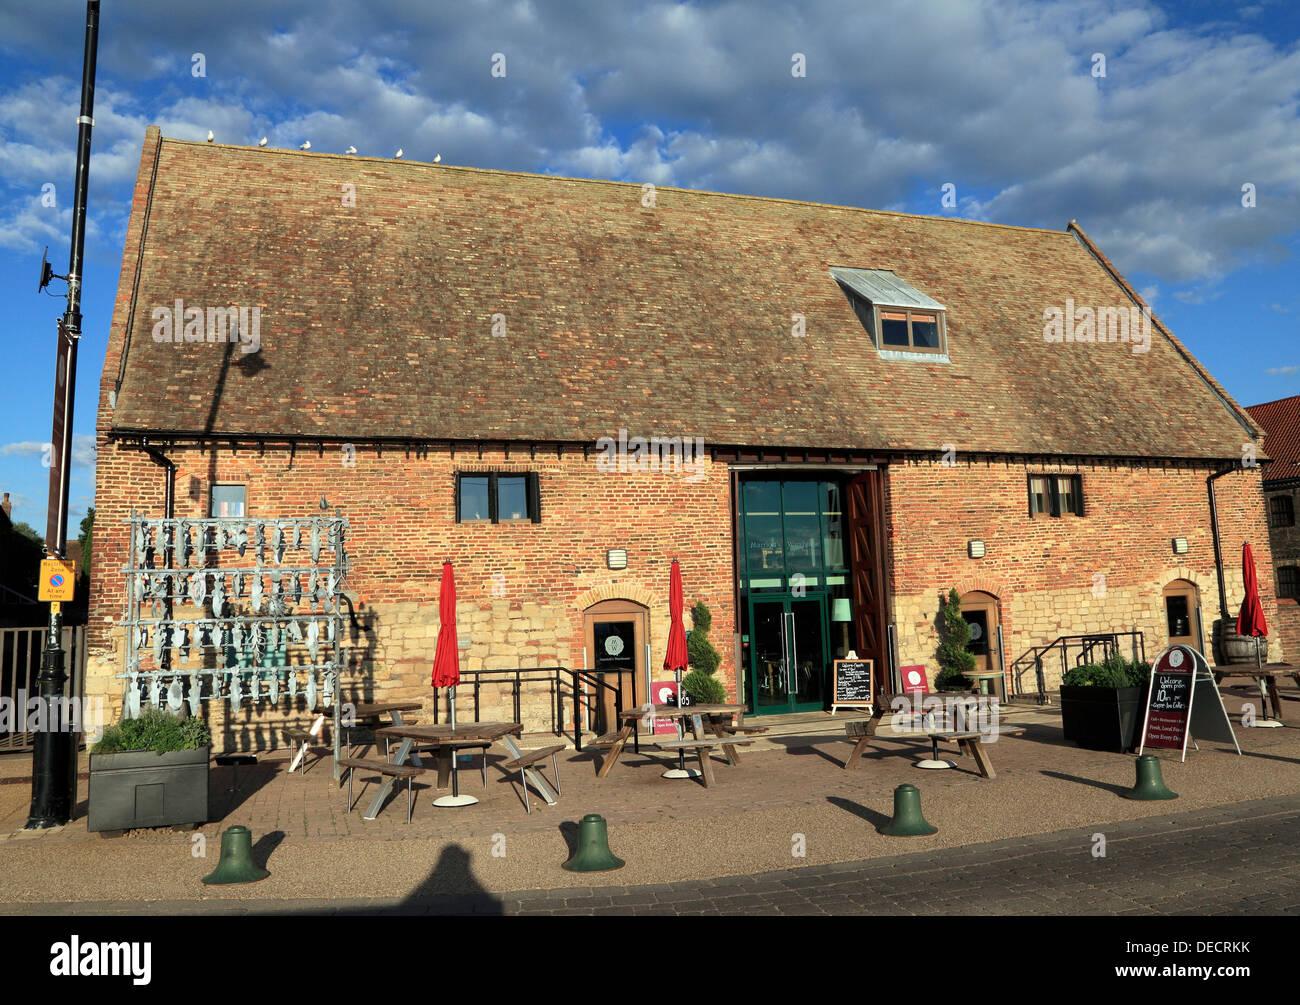 Marriott's Warehouse, South Quay, Kings Lynn, Norfolk England UK quayside médiévale transformée en restaurant la grange Photo Stock